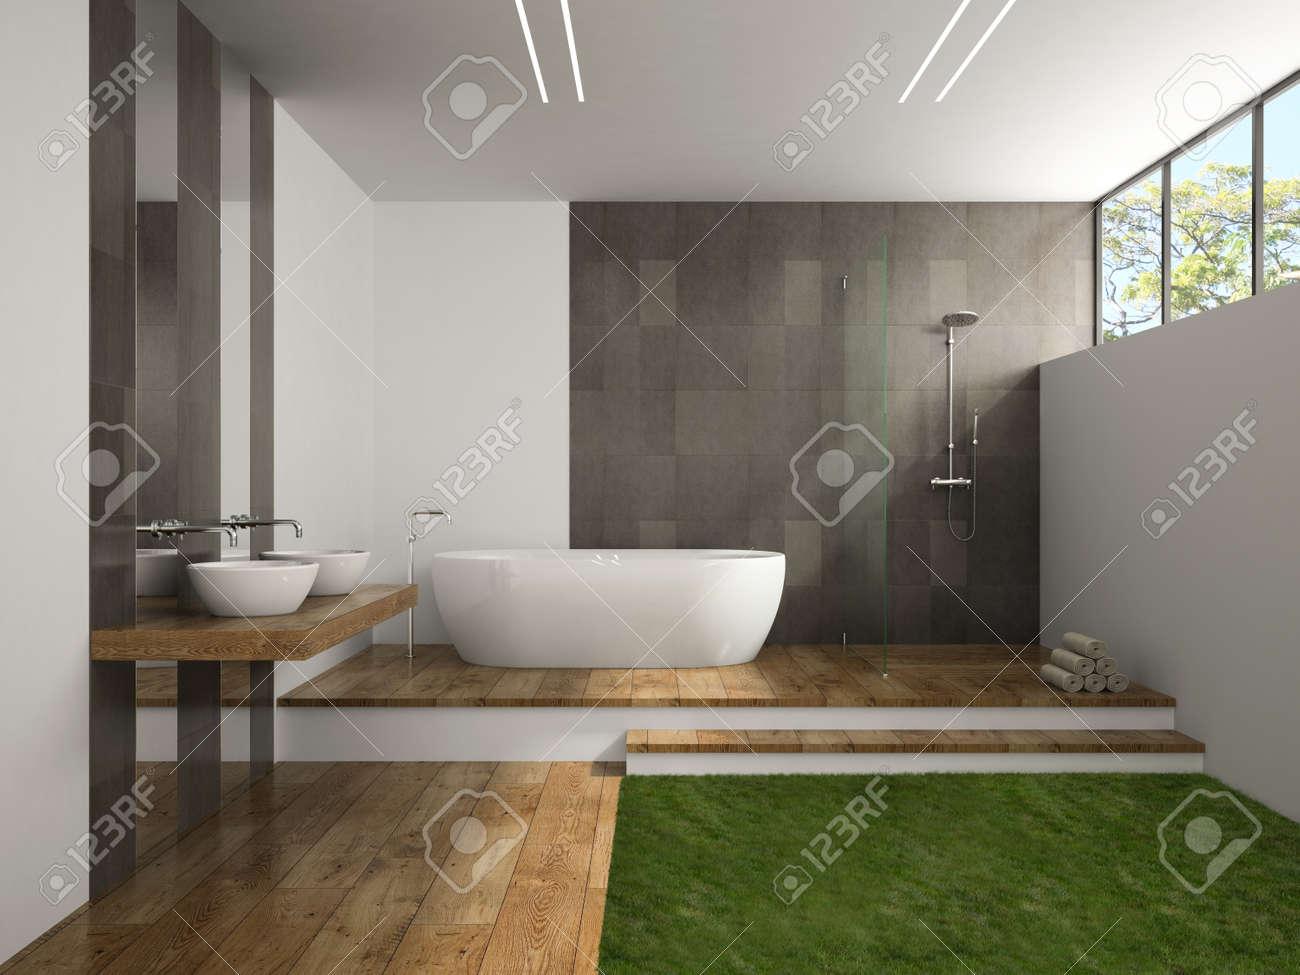 interno del bagno con il rendering 3d piano erba foto royalty free ... - Arredo Bagno Erba